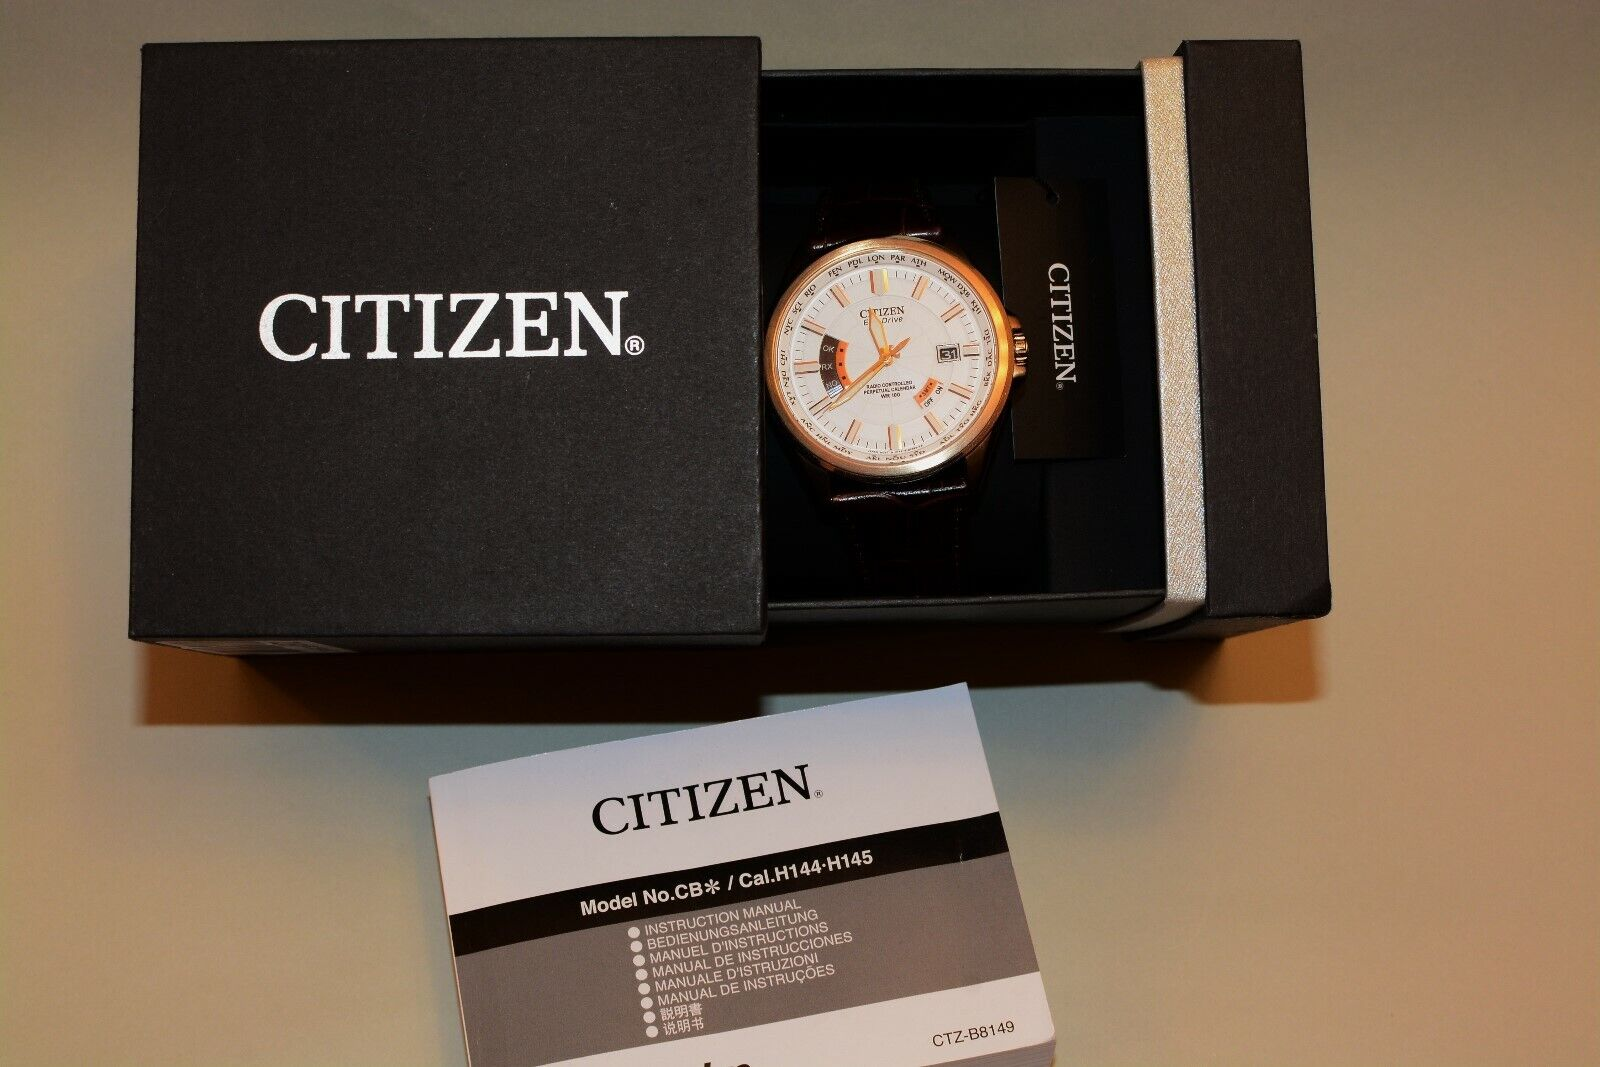 Citizen Herren-Armbanduhr NP.449.-€ Eco-Drive Radio-Controlled Leder CB0013-04A